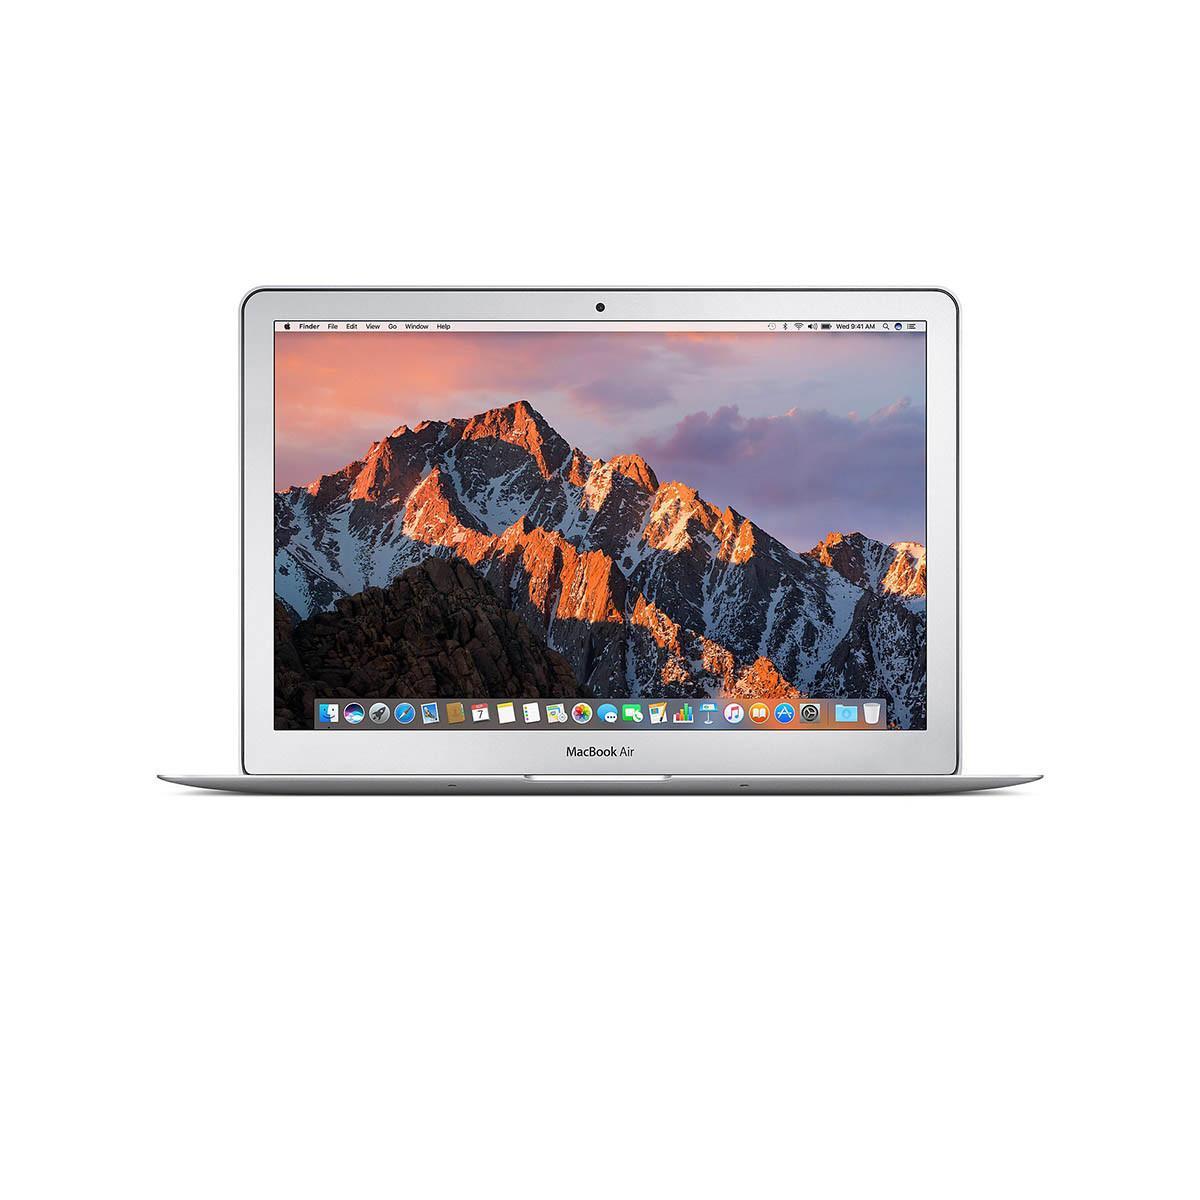 13in Macbook Air